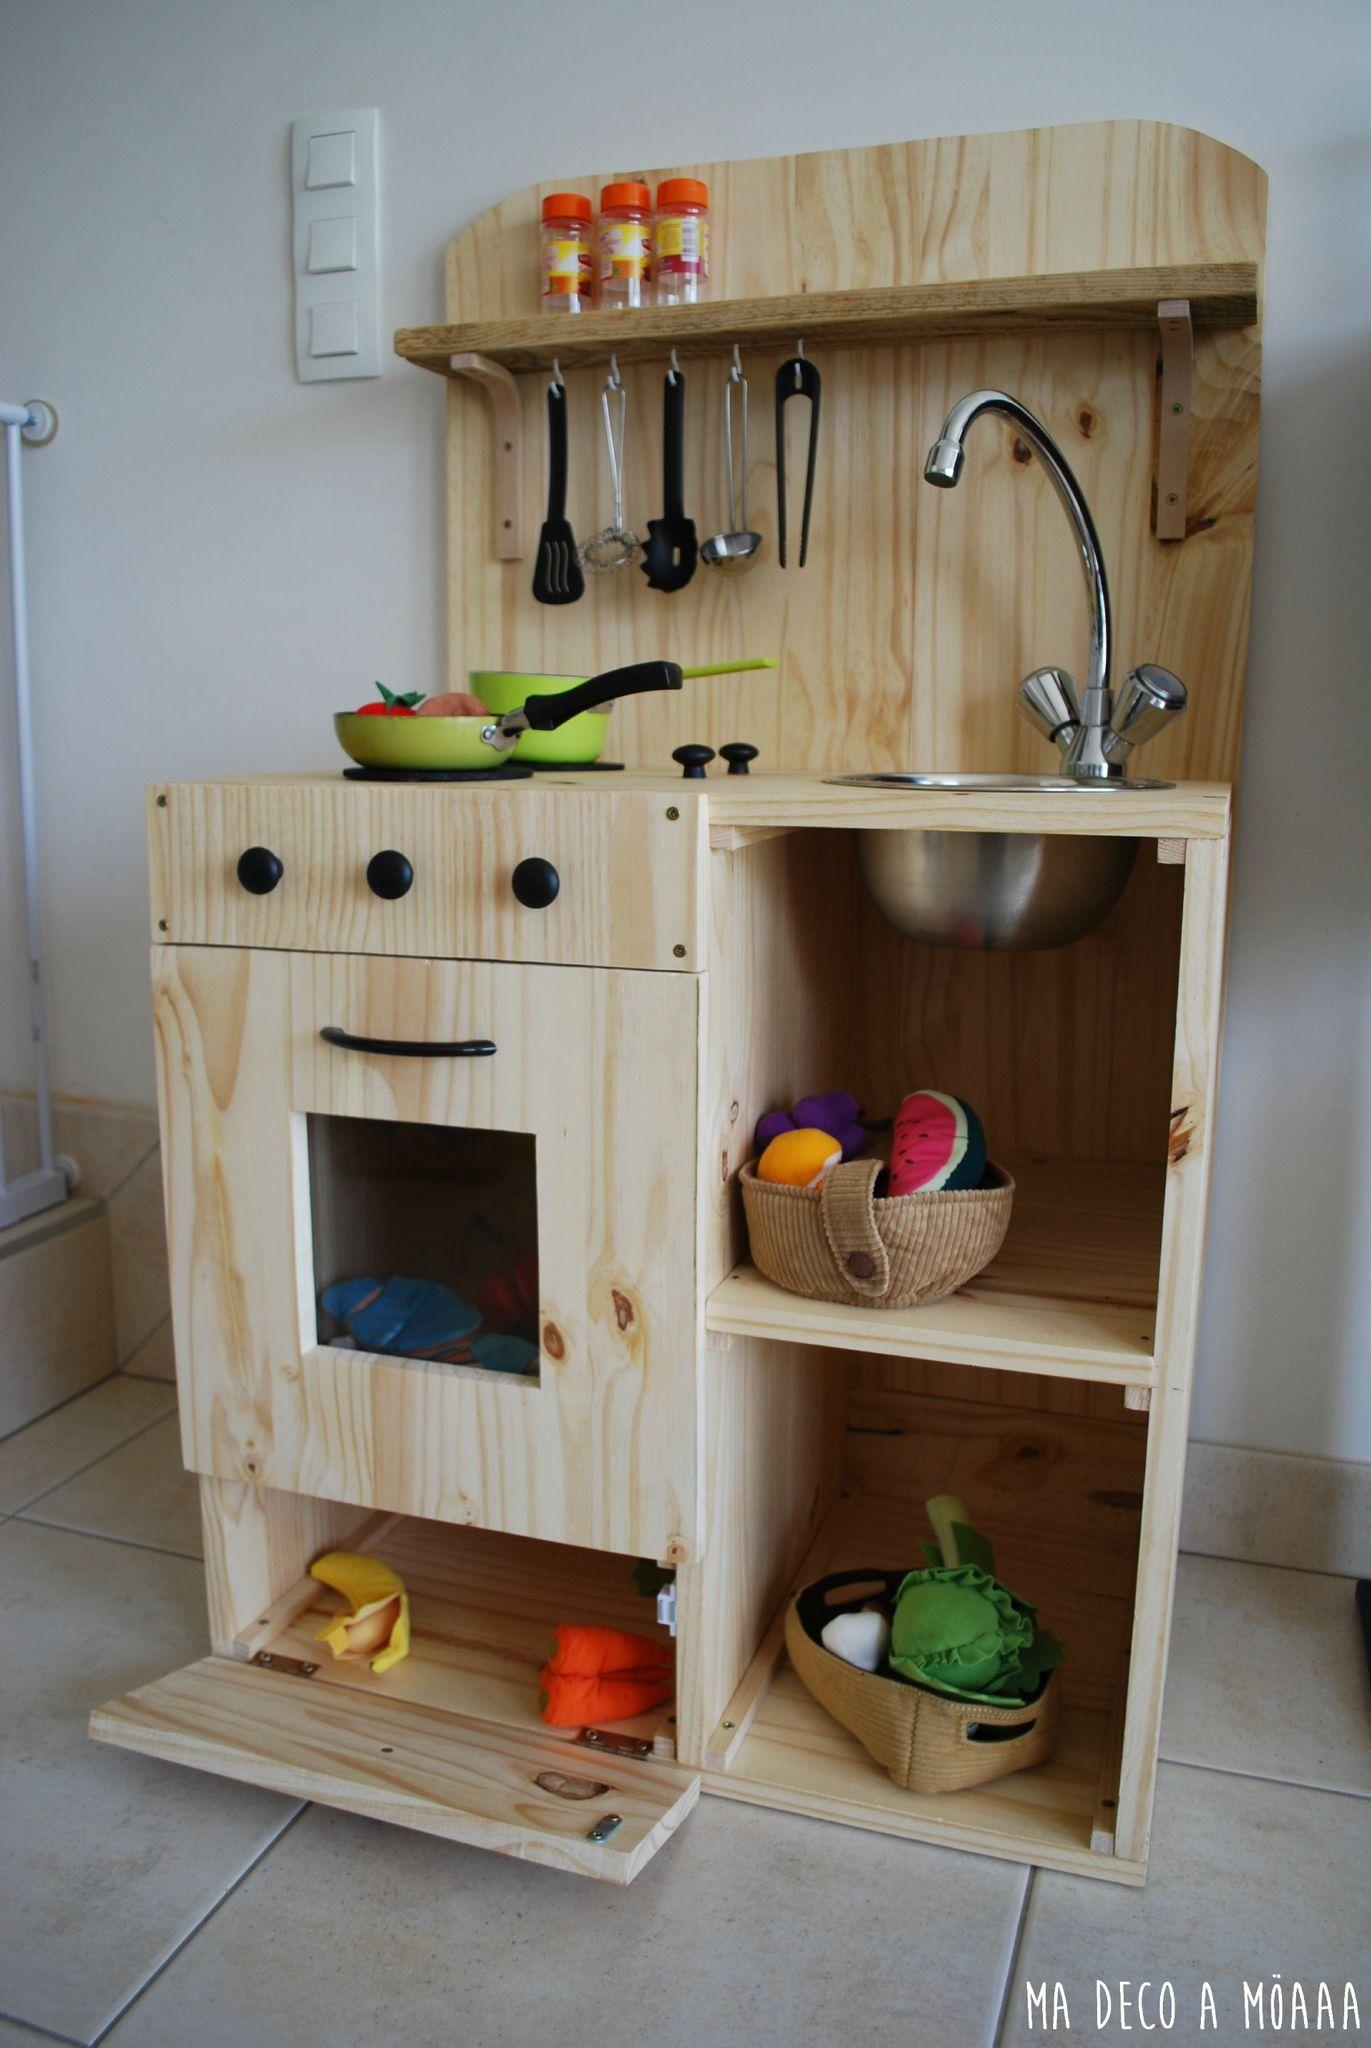 Gallery Of Kids Kitchen Cocina Nios Cocinita Cuisine